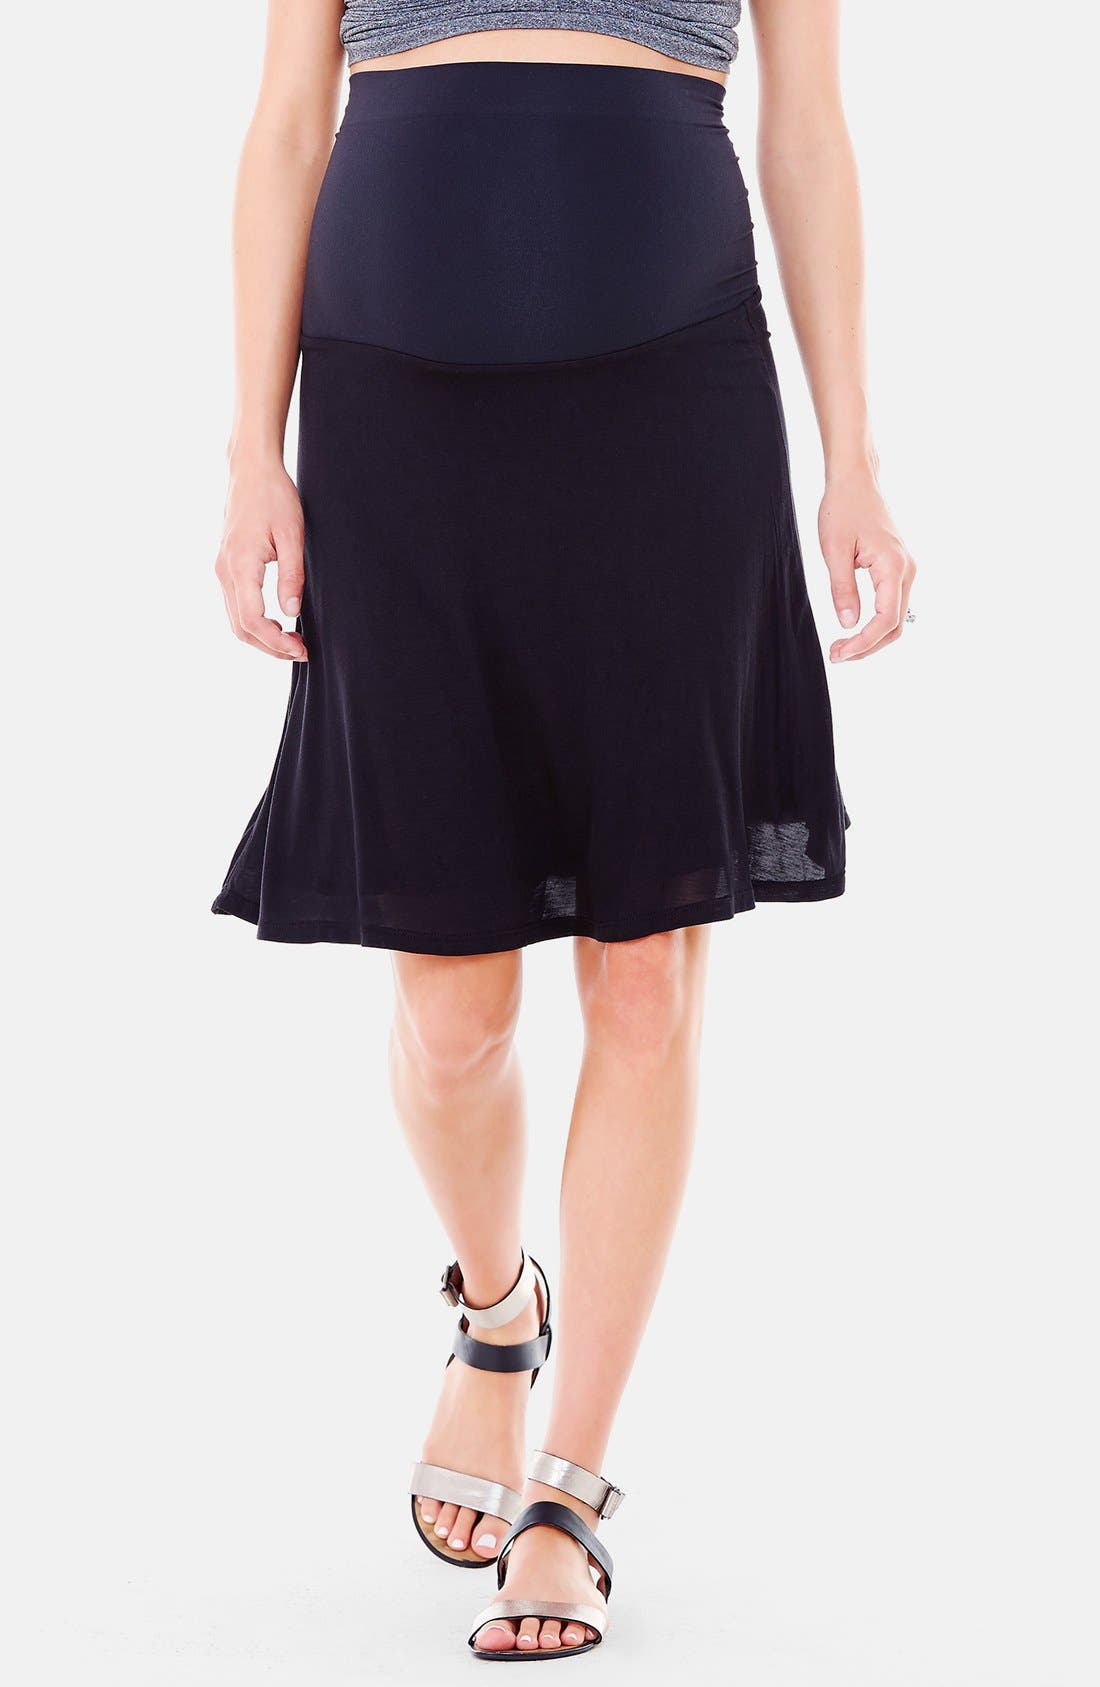 Alternate Image 1 Selected - Ingrid & Isabel® 'Flowy' Maternity Skirt